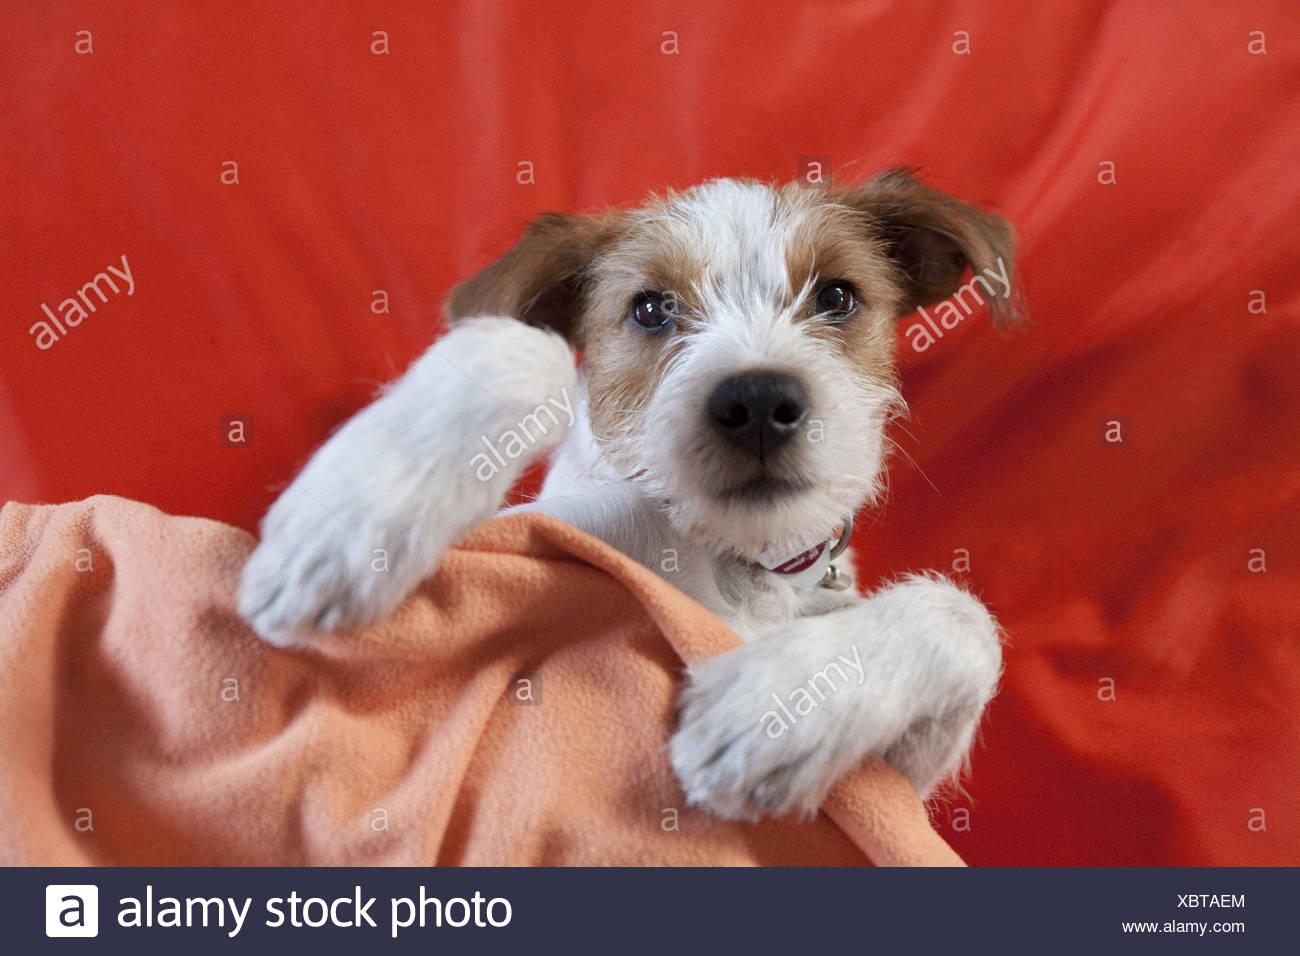 Terriers, puppy, bed, lie, covered, dog, Kromfohrländer, sleeping, sweetly, animal child, cheeky, pet, animal, inside, - Stock Image